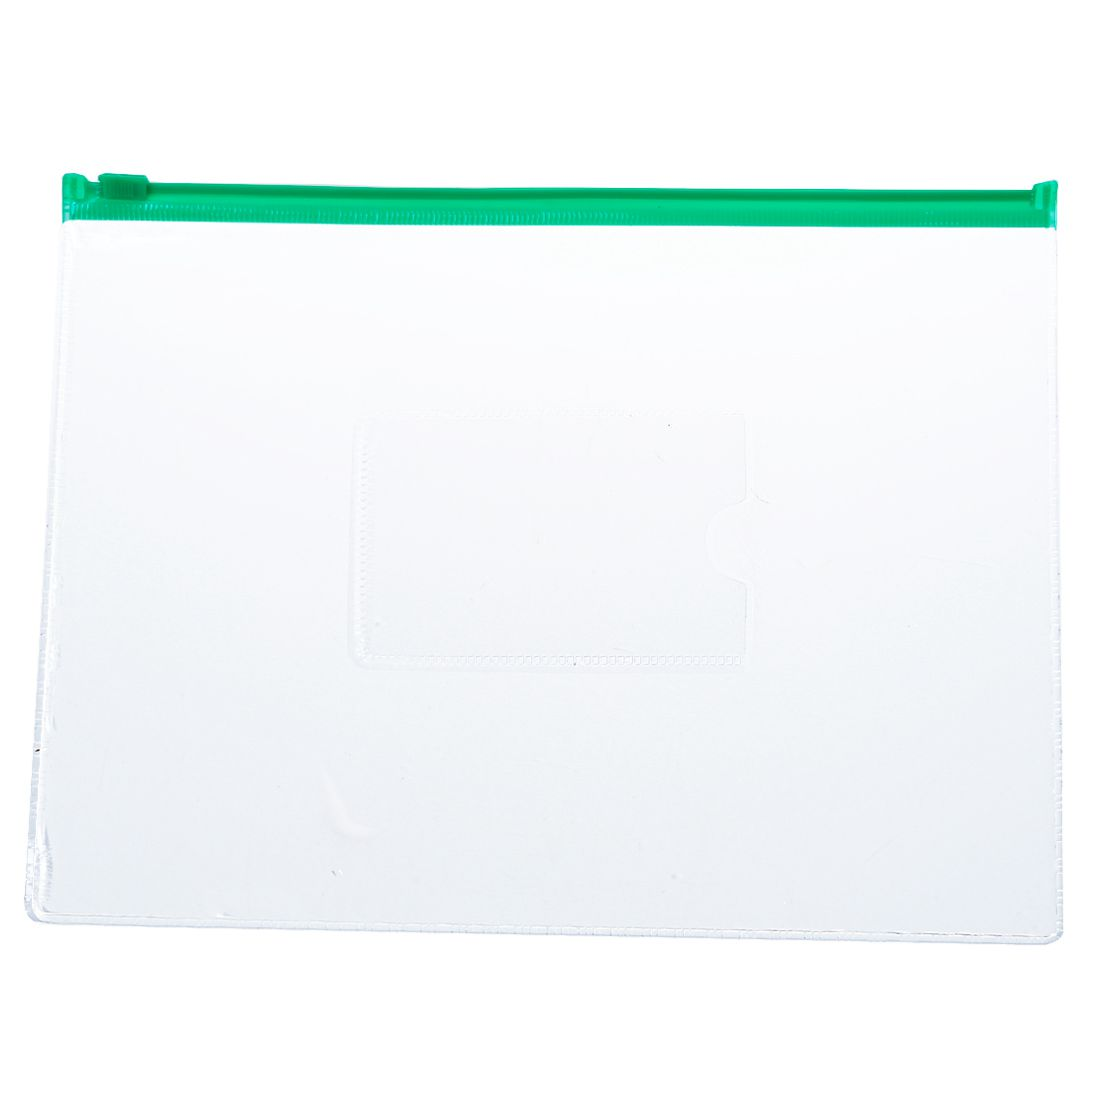 20 Pcs Green Clear Size A5 Paper Slider Ziplock Closure Folders Files Bags